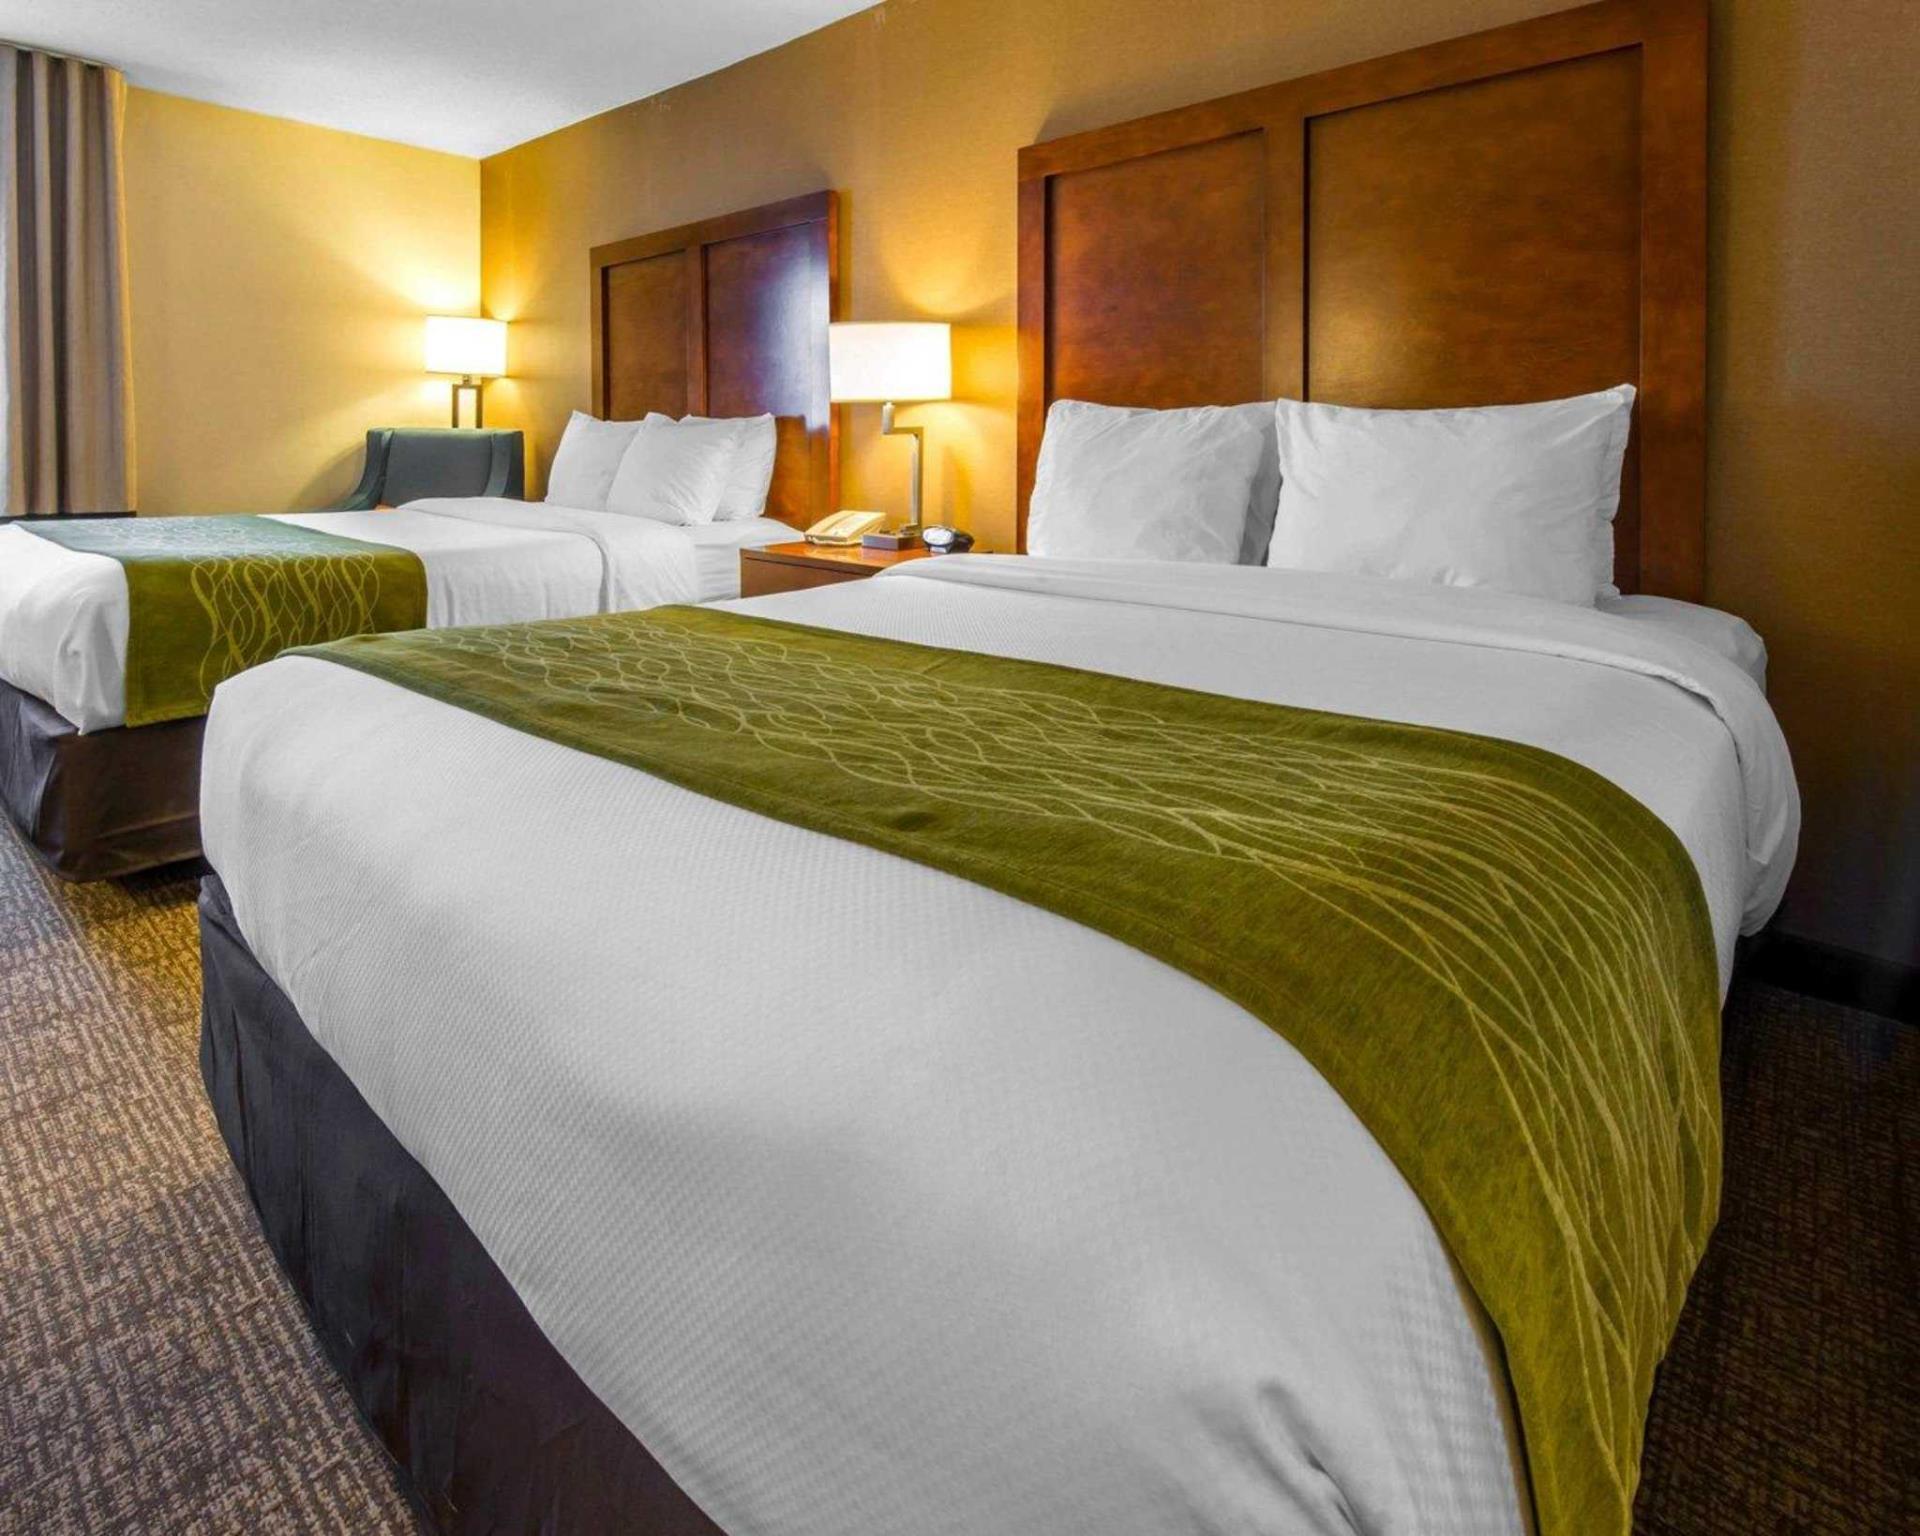 Comfort Inn and Suites Erie, Erie